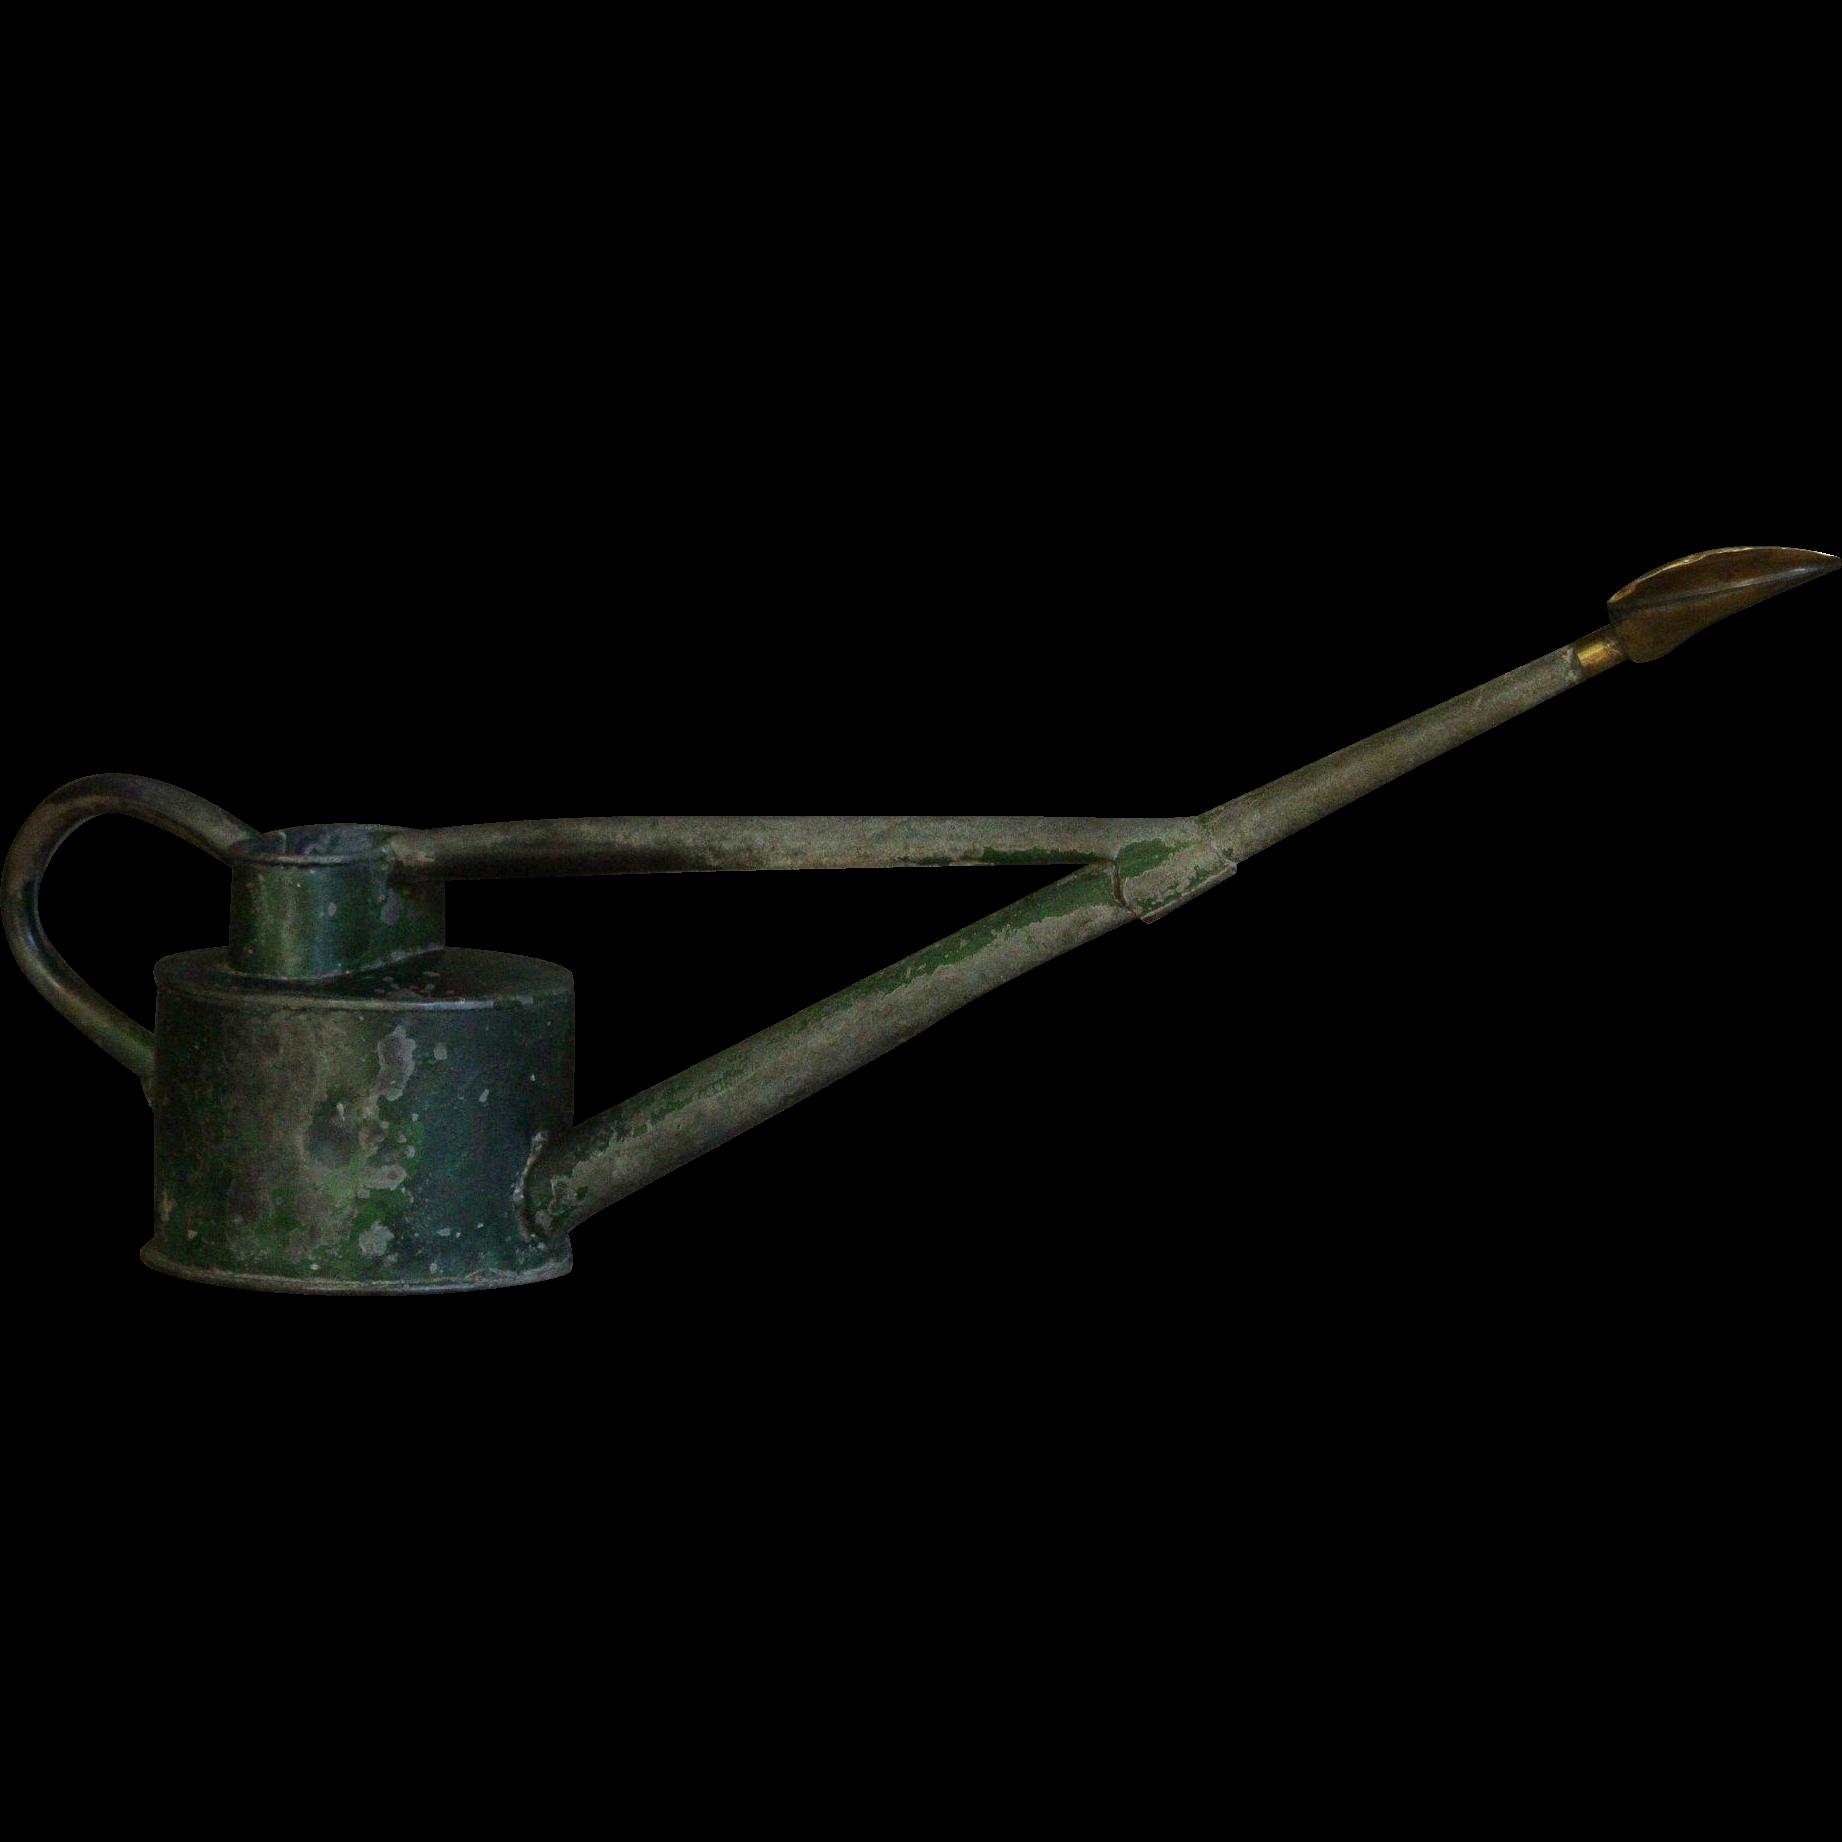 VIntage English Zinc Garden Watering Can - Original Green Paint.